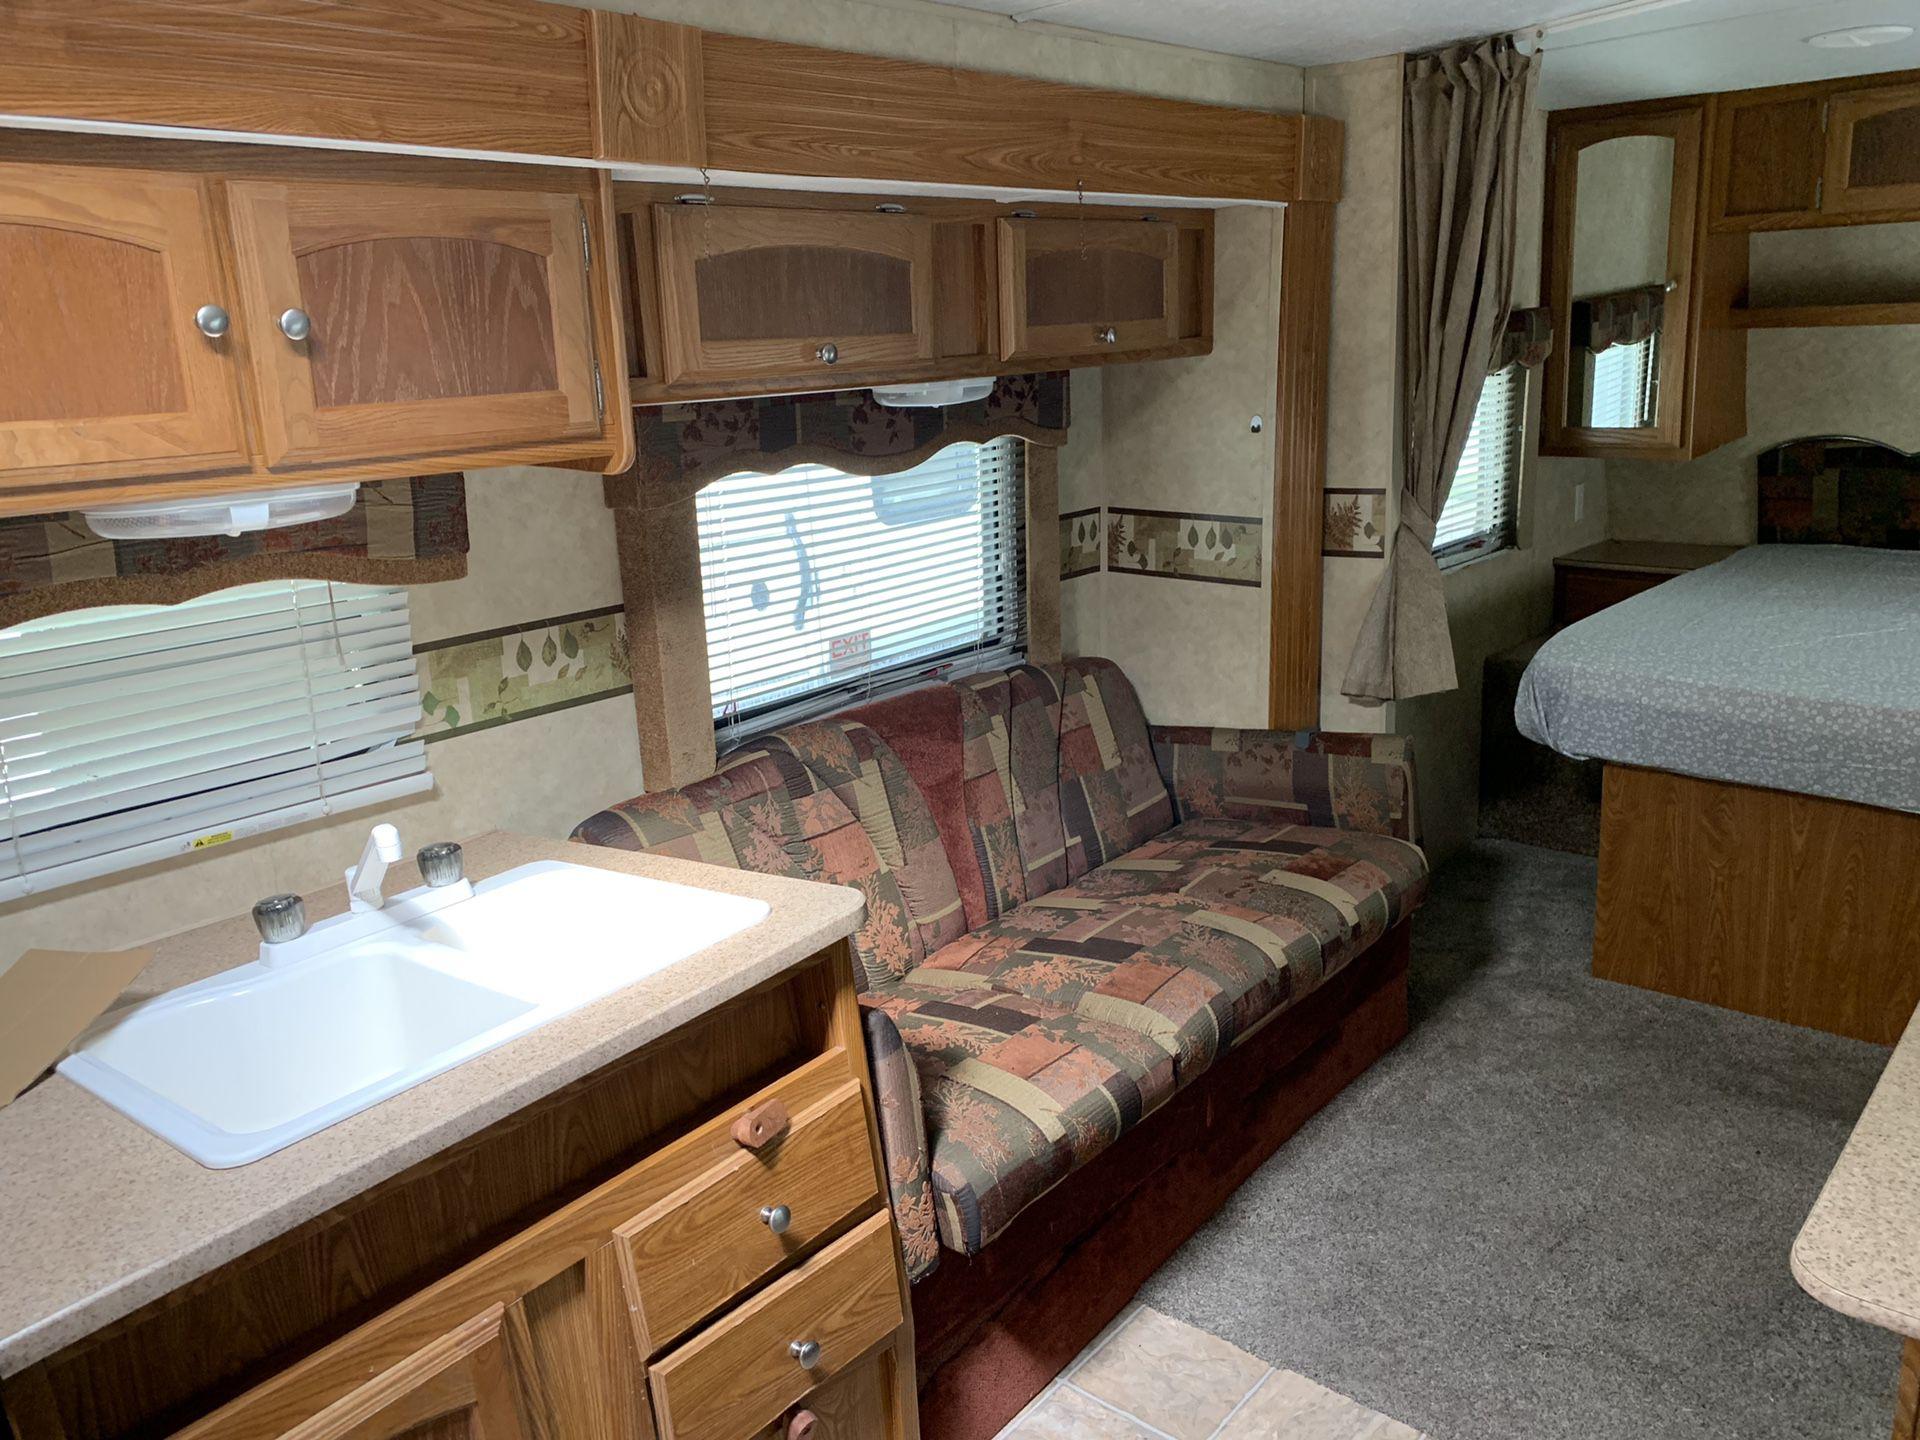 2009 Rainier by Dutchmen 26ft travel trailer